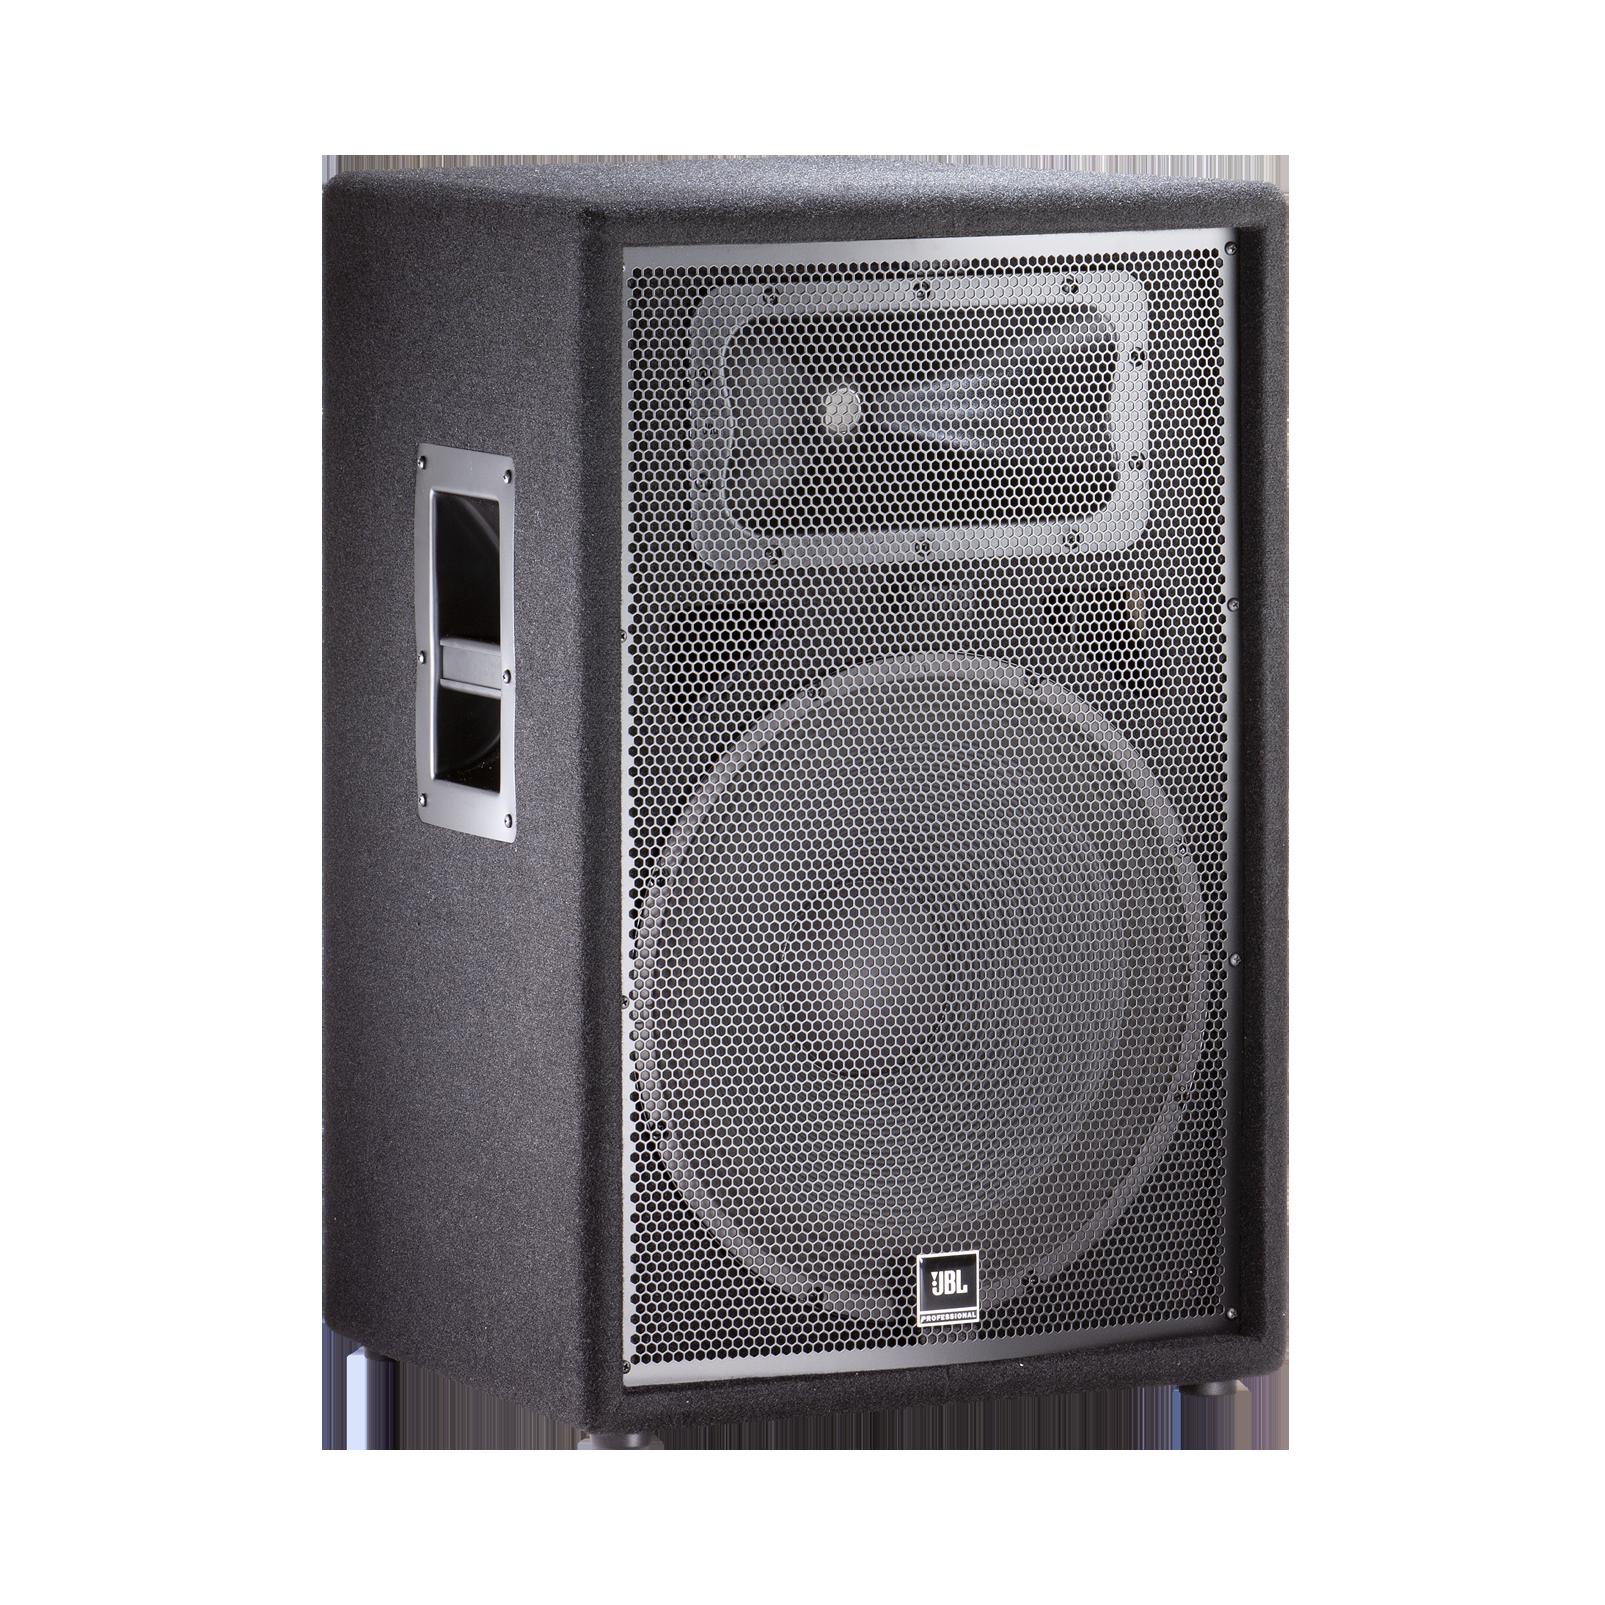 "JBL JRX215 - Black - 15"" Two-Way Sound Reinforcement Loudspeaker System - Hero"